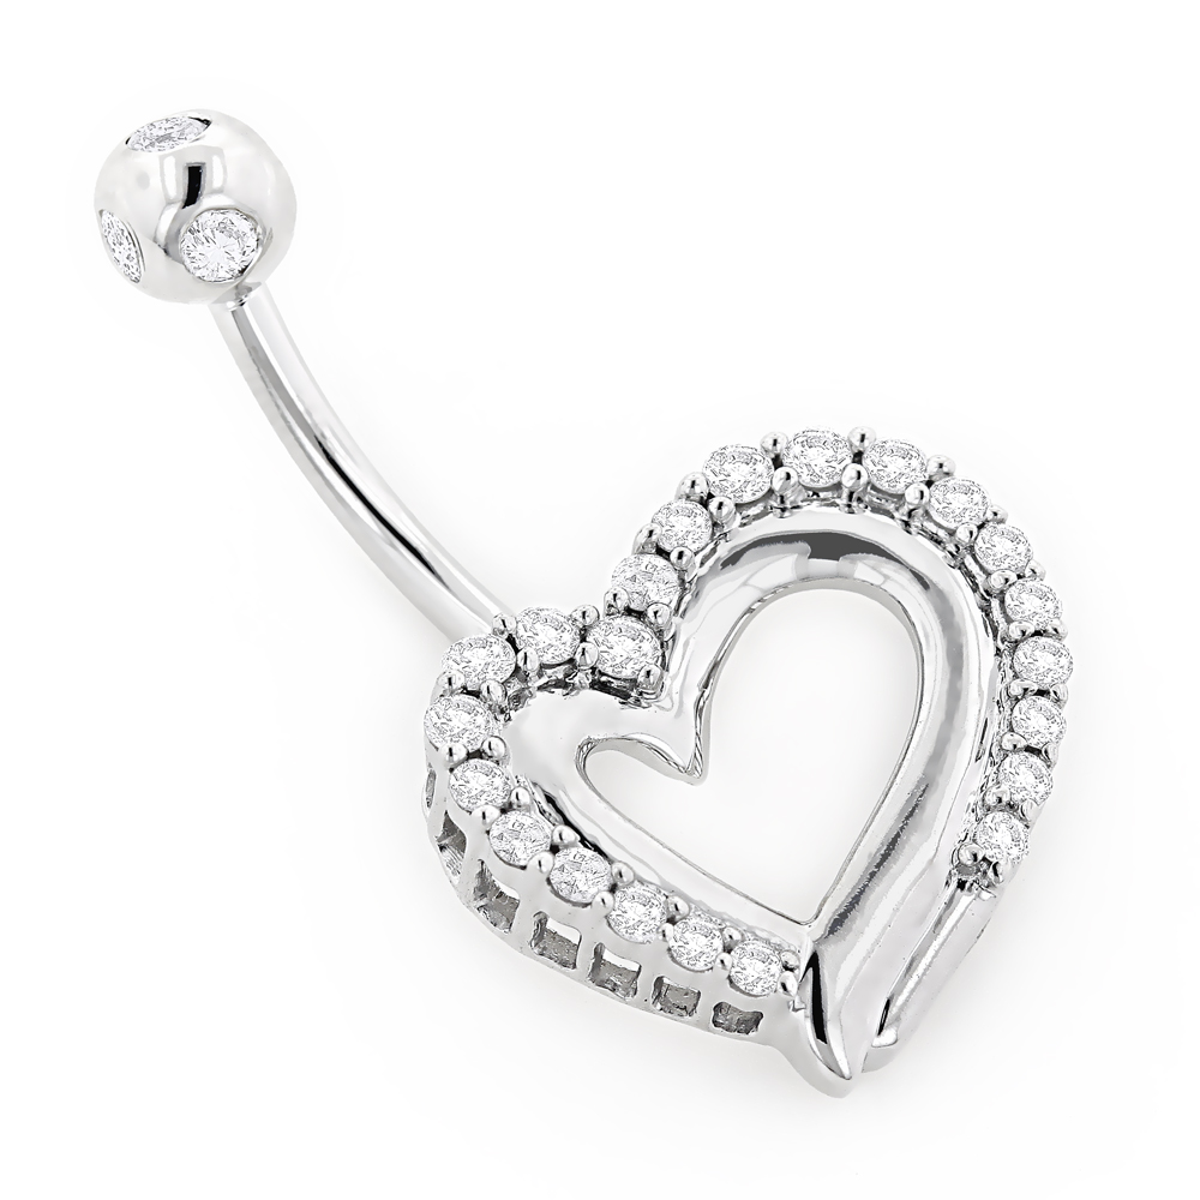 14K Gold Diamond Belly Button Jewelry Piece 0.4ct